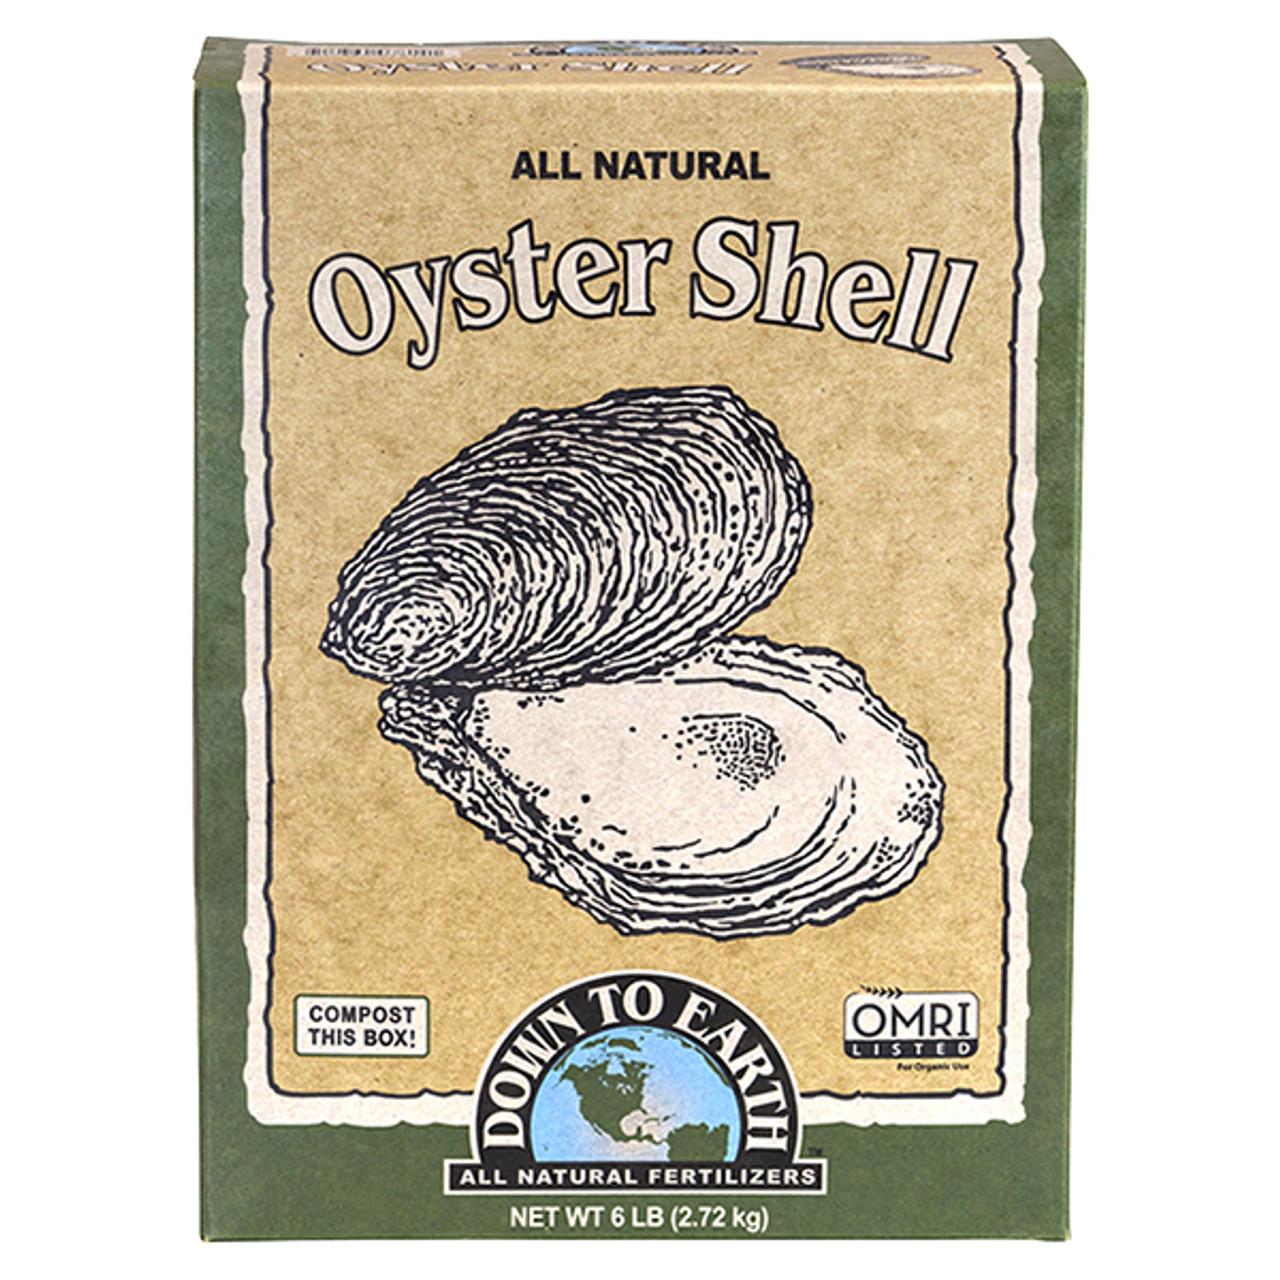 DE Oyster Shell 6lb